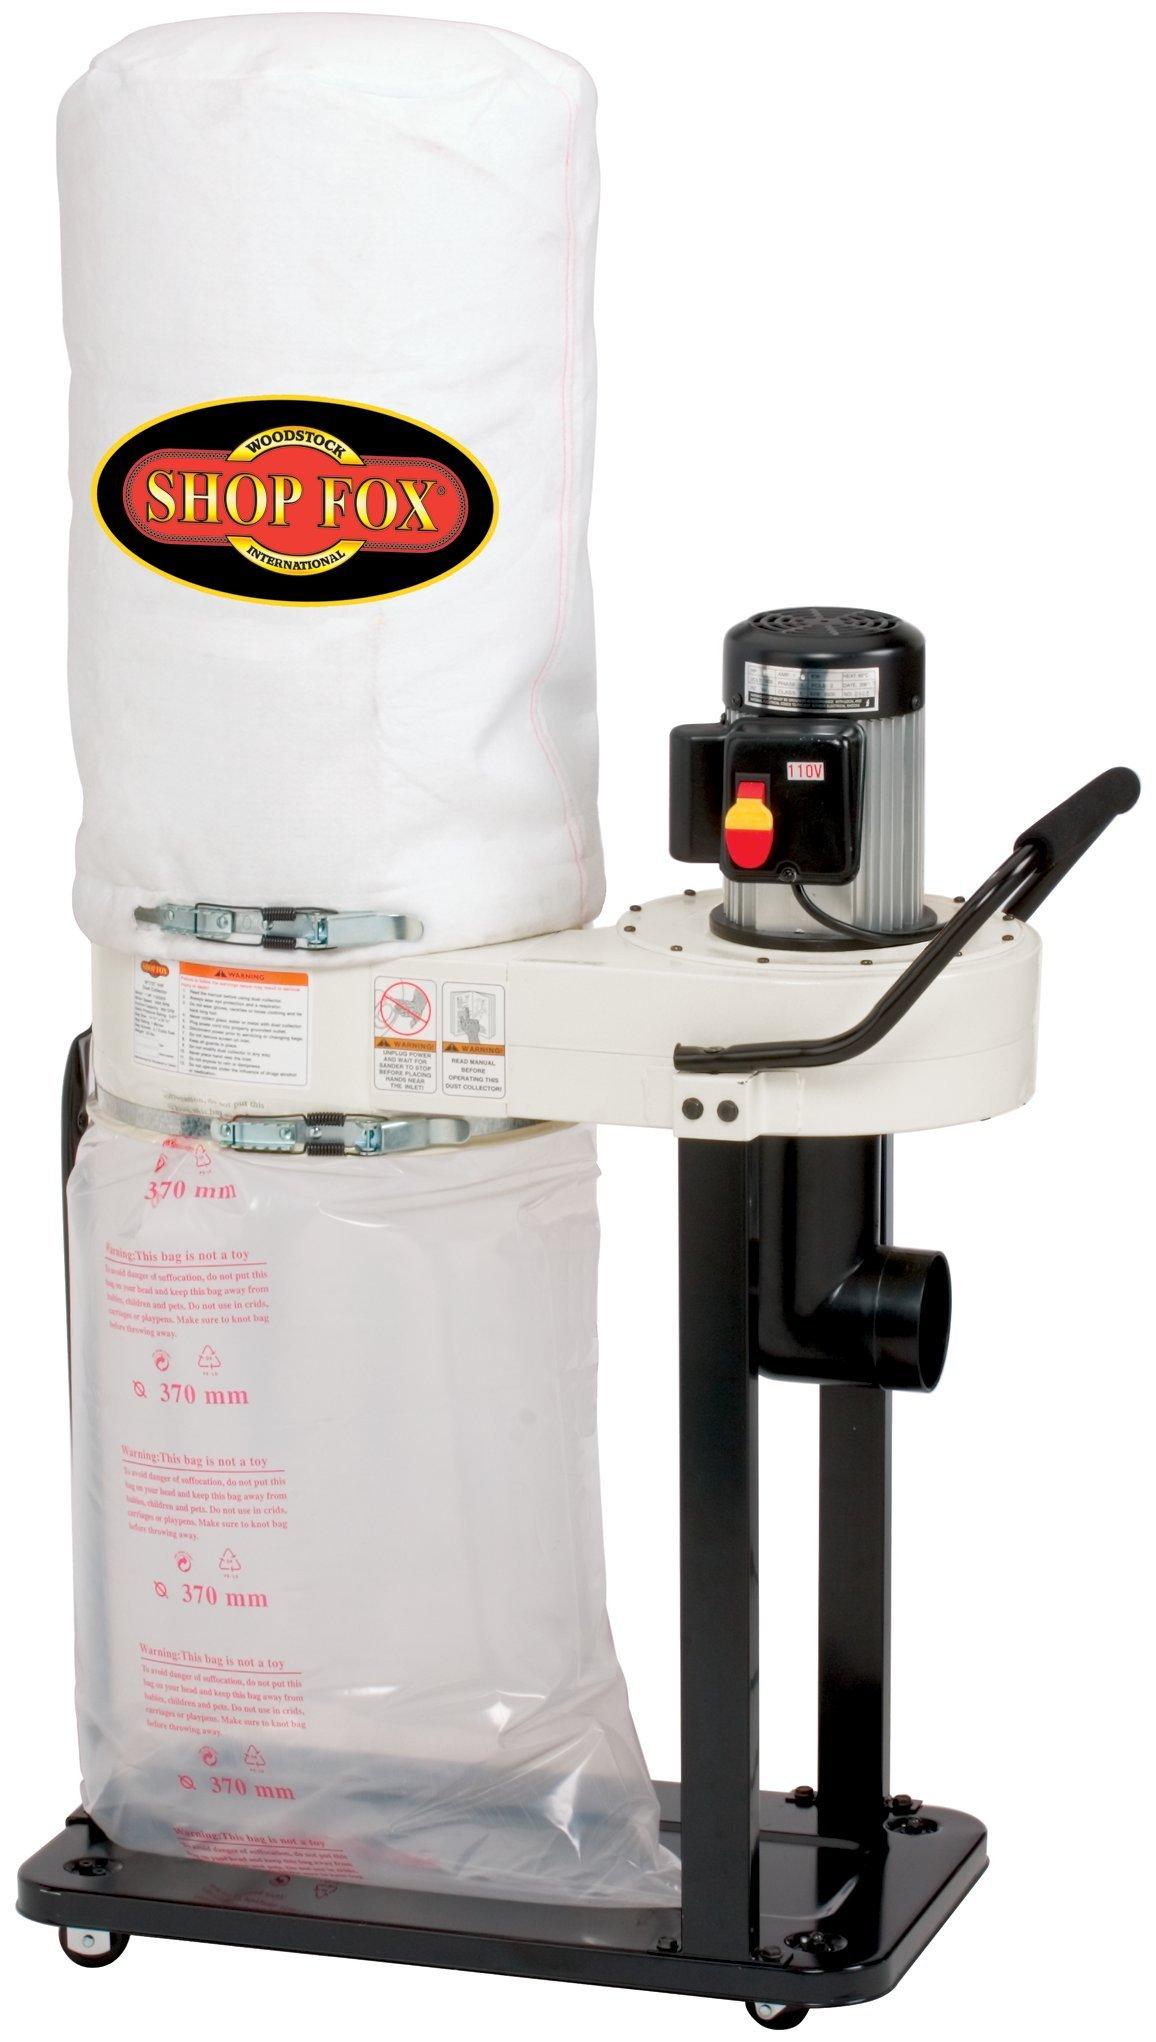 SHOP FOX W1727 Dust Collector